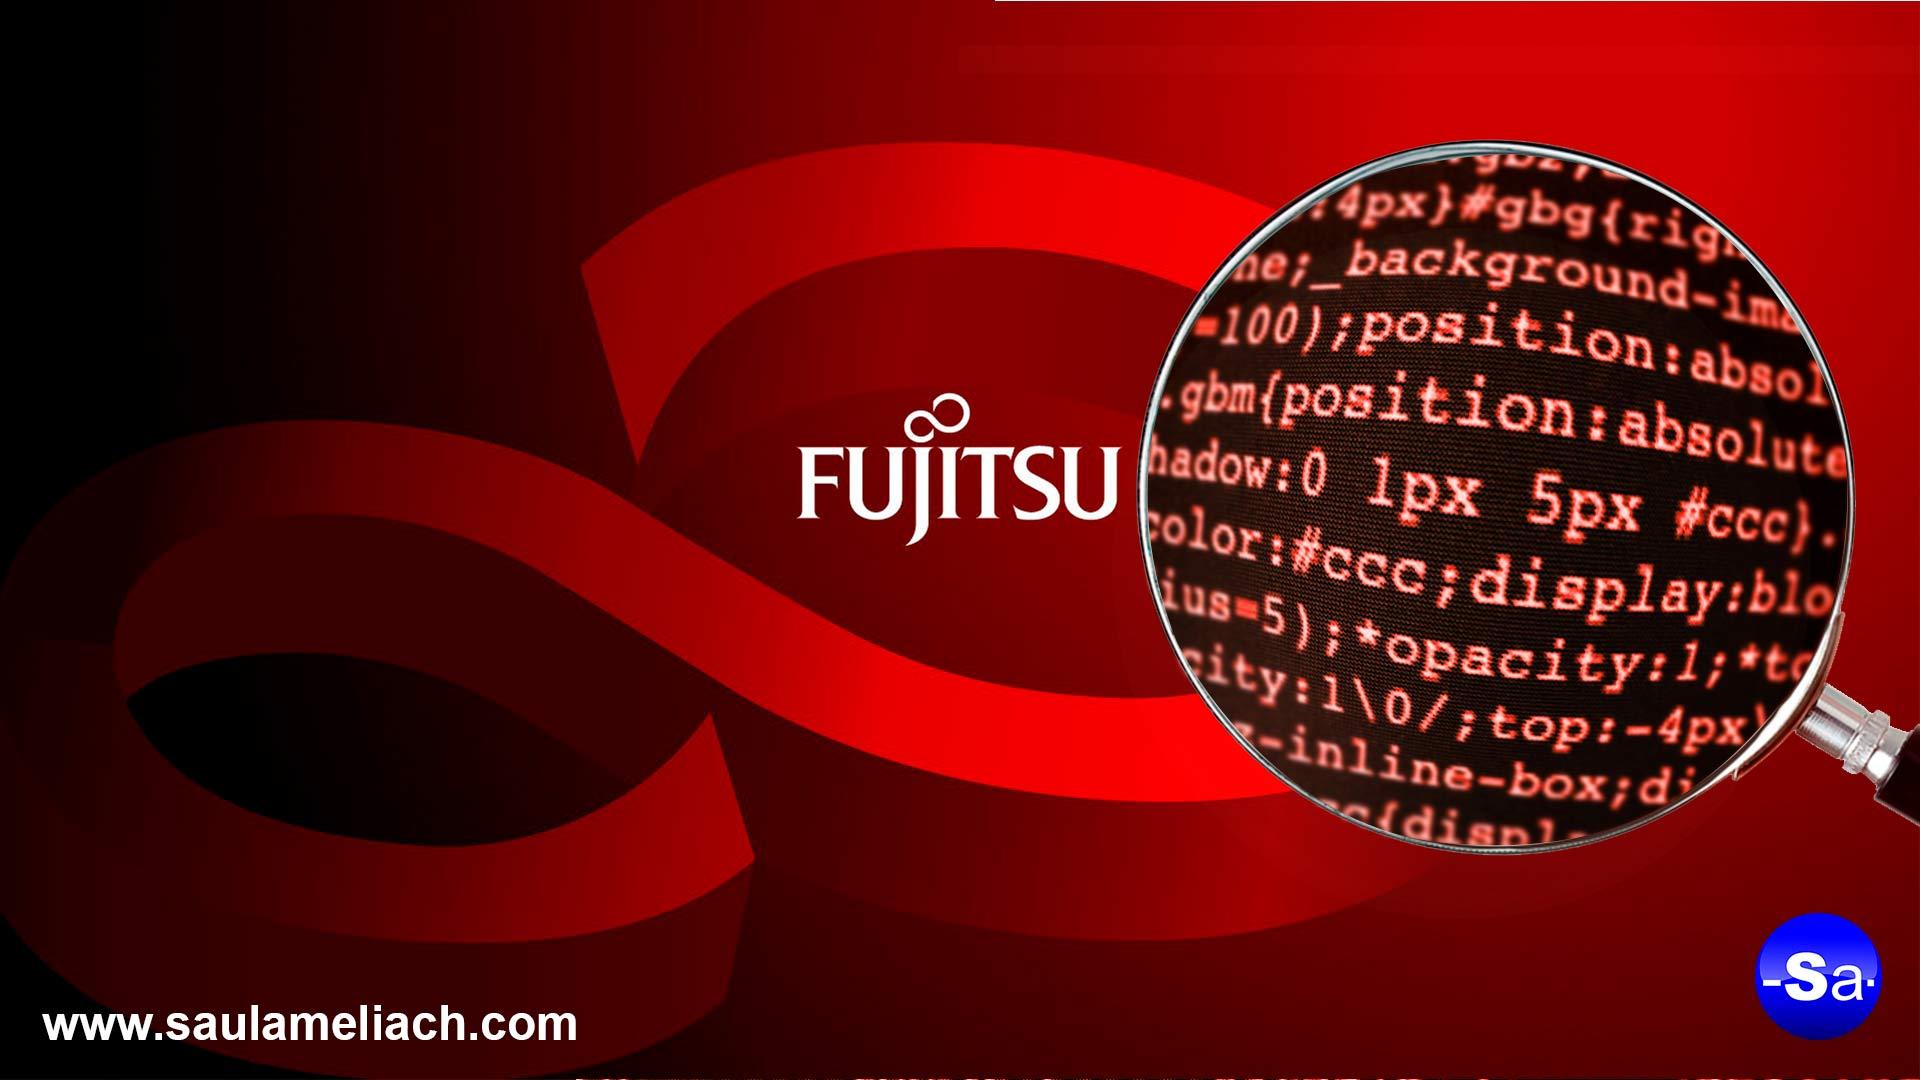 Fujitsu - saul - ameliach